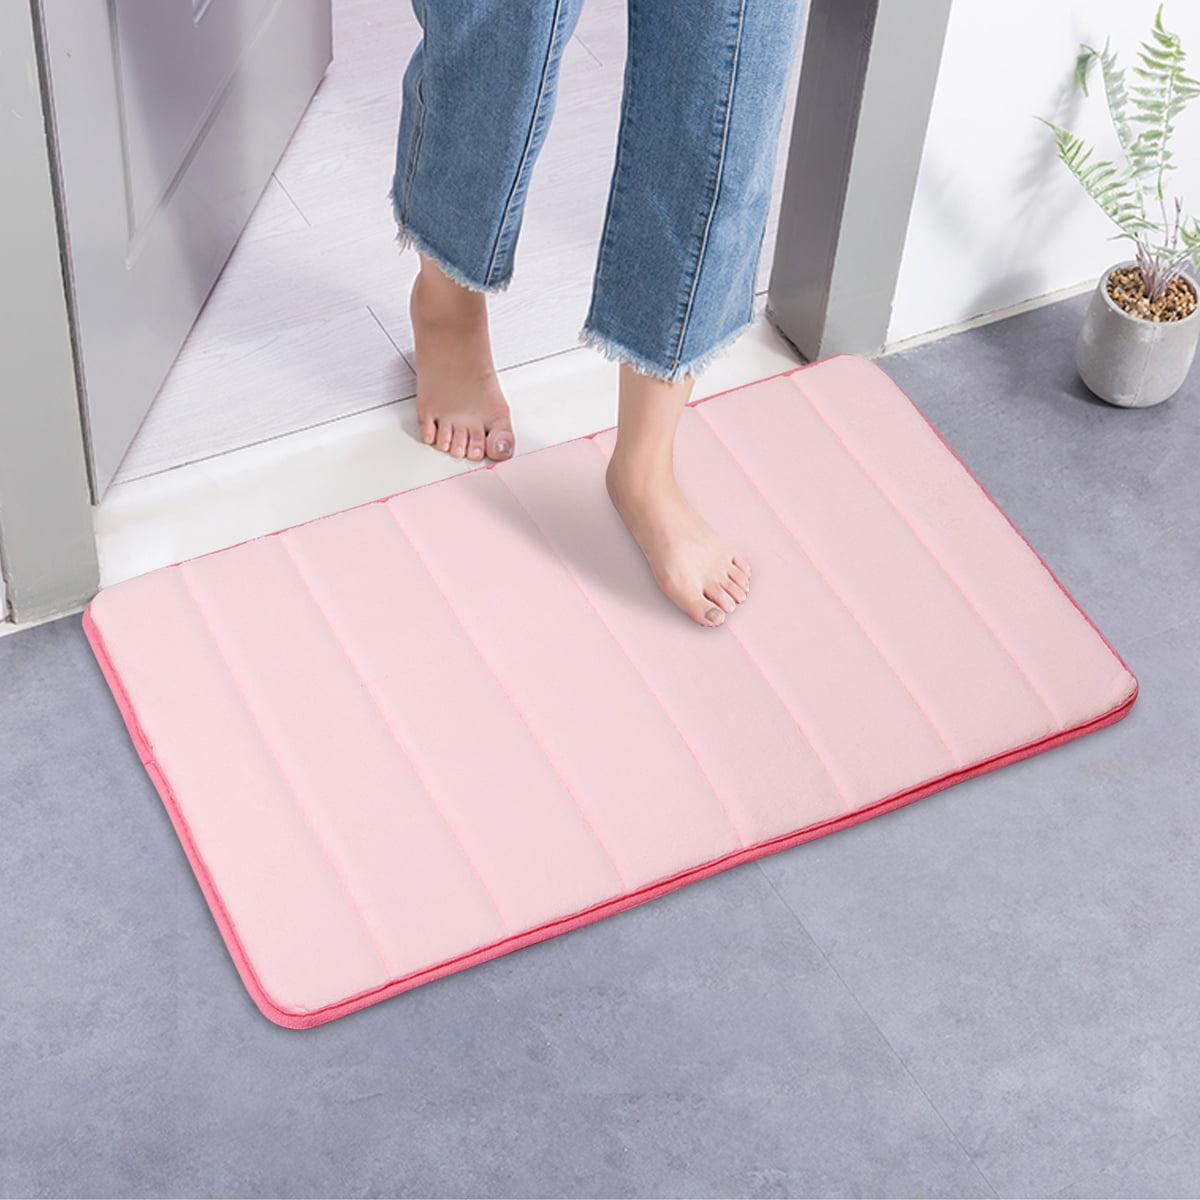 32''x20'' Non-slip Soft Comfortable Memory Foam Absorbent Bath Bathroom Bedroom Kitchen Dorm Floor Shower Rug Carpet Home Decal 80x50cm